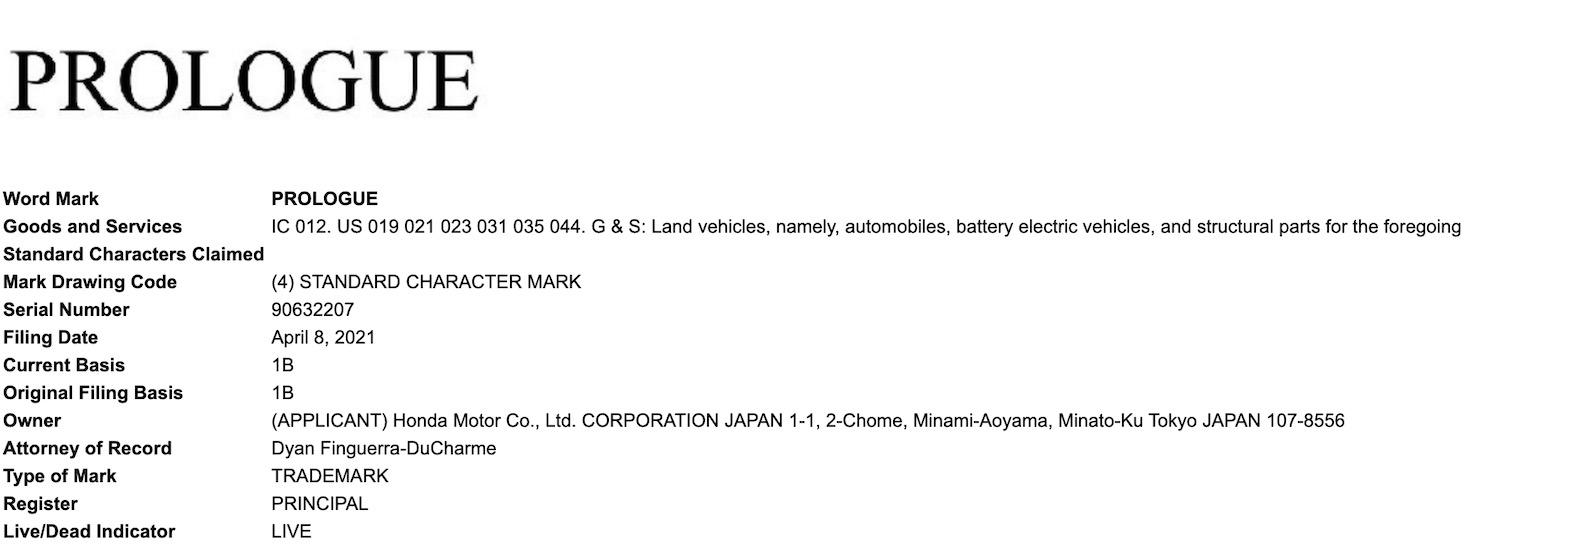 Honda Prologue Trademark